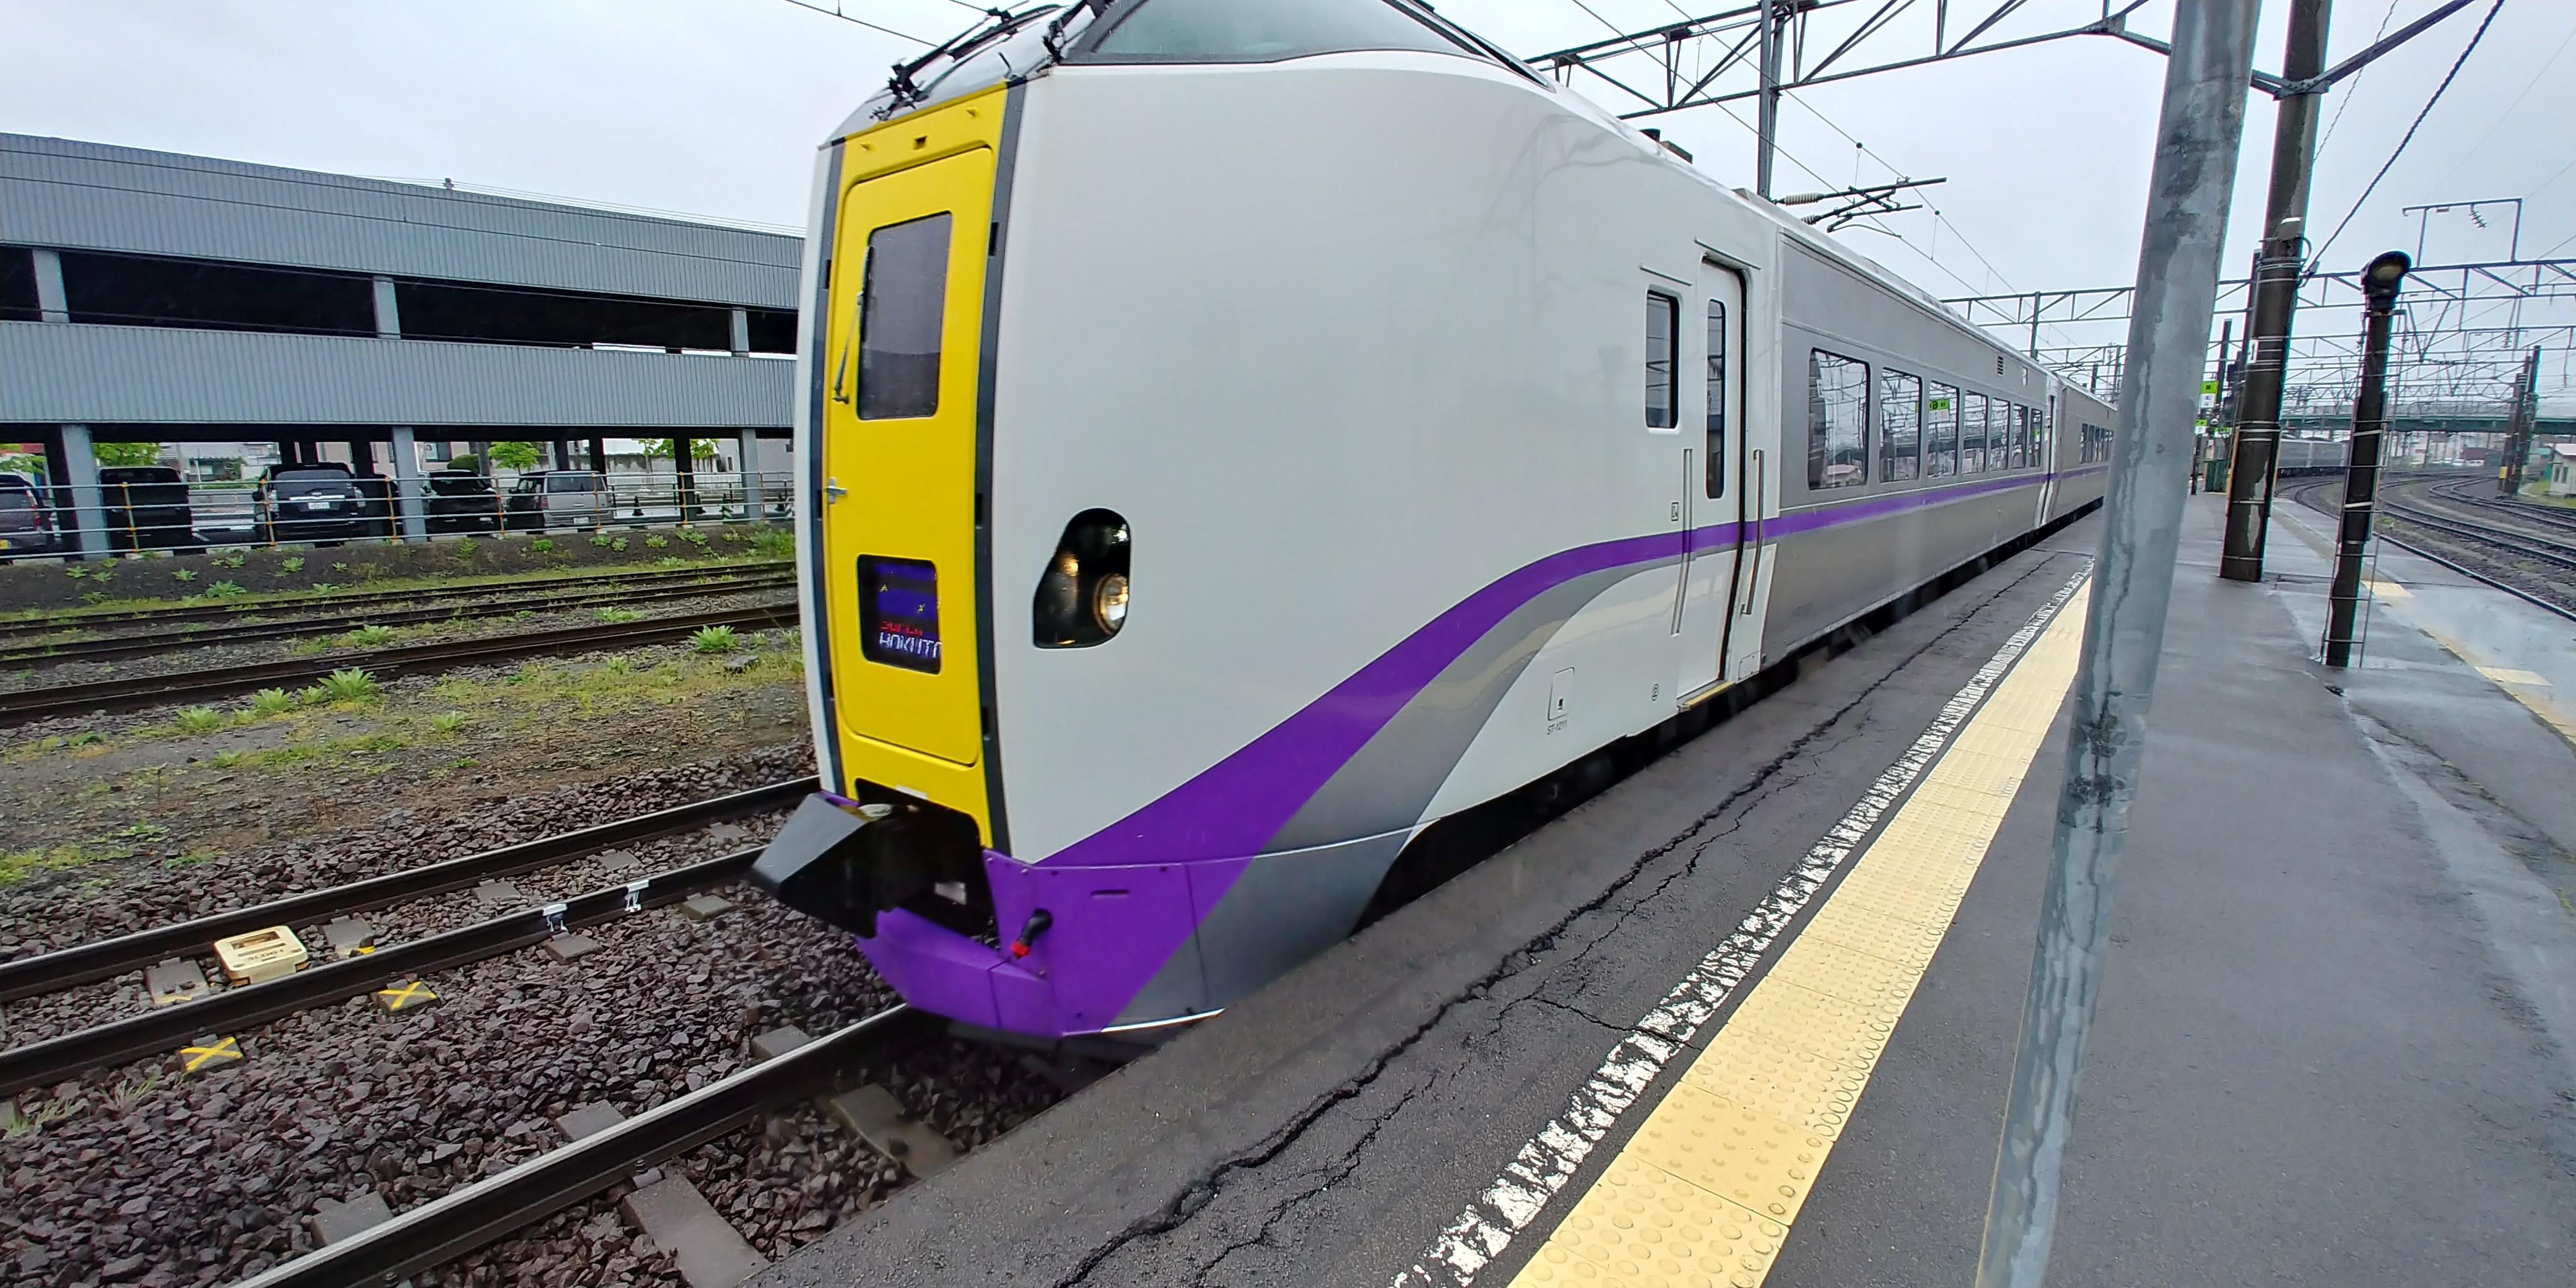 f:id:kishuji-kaisoku:20190802002010j:image